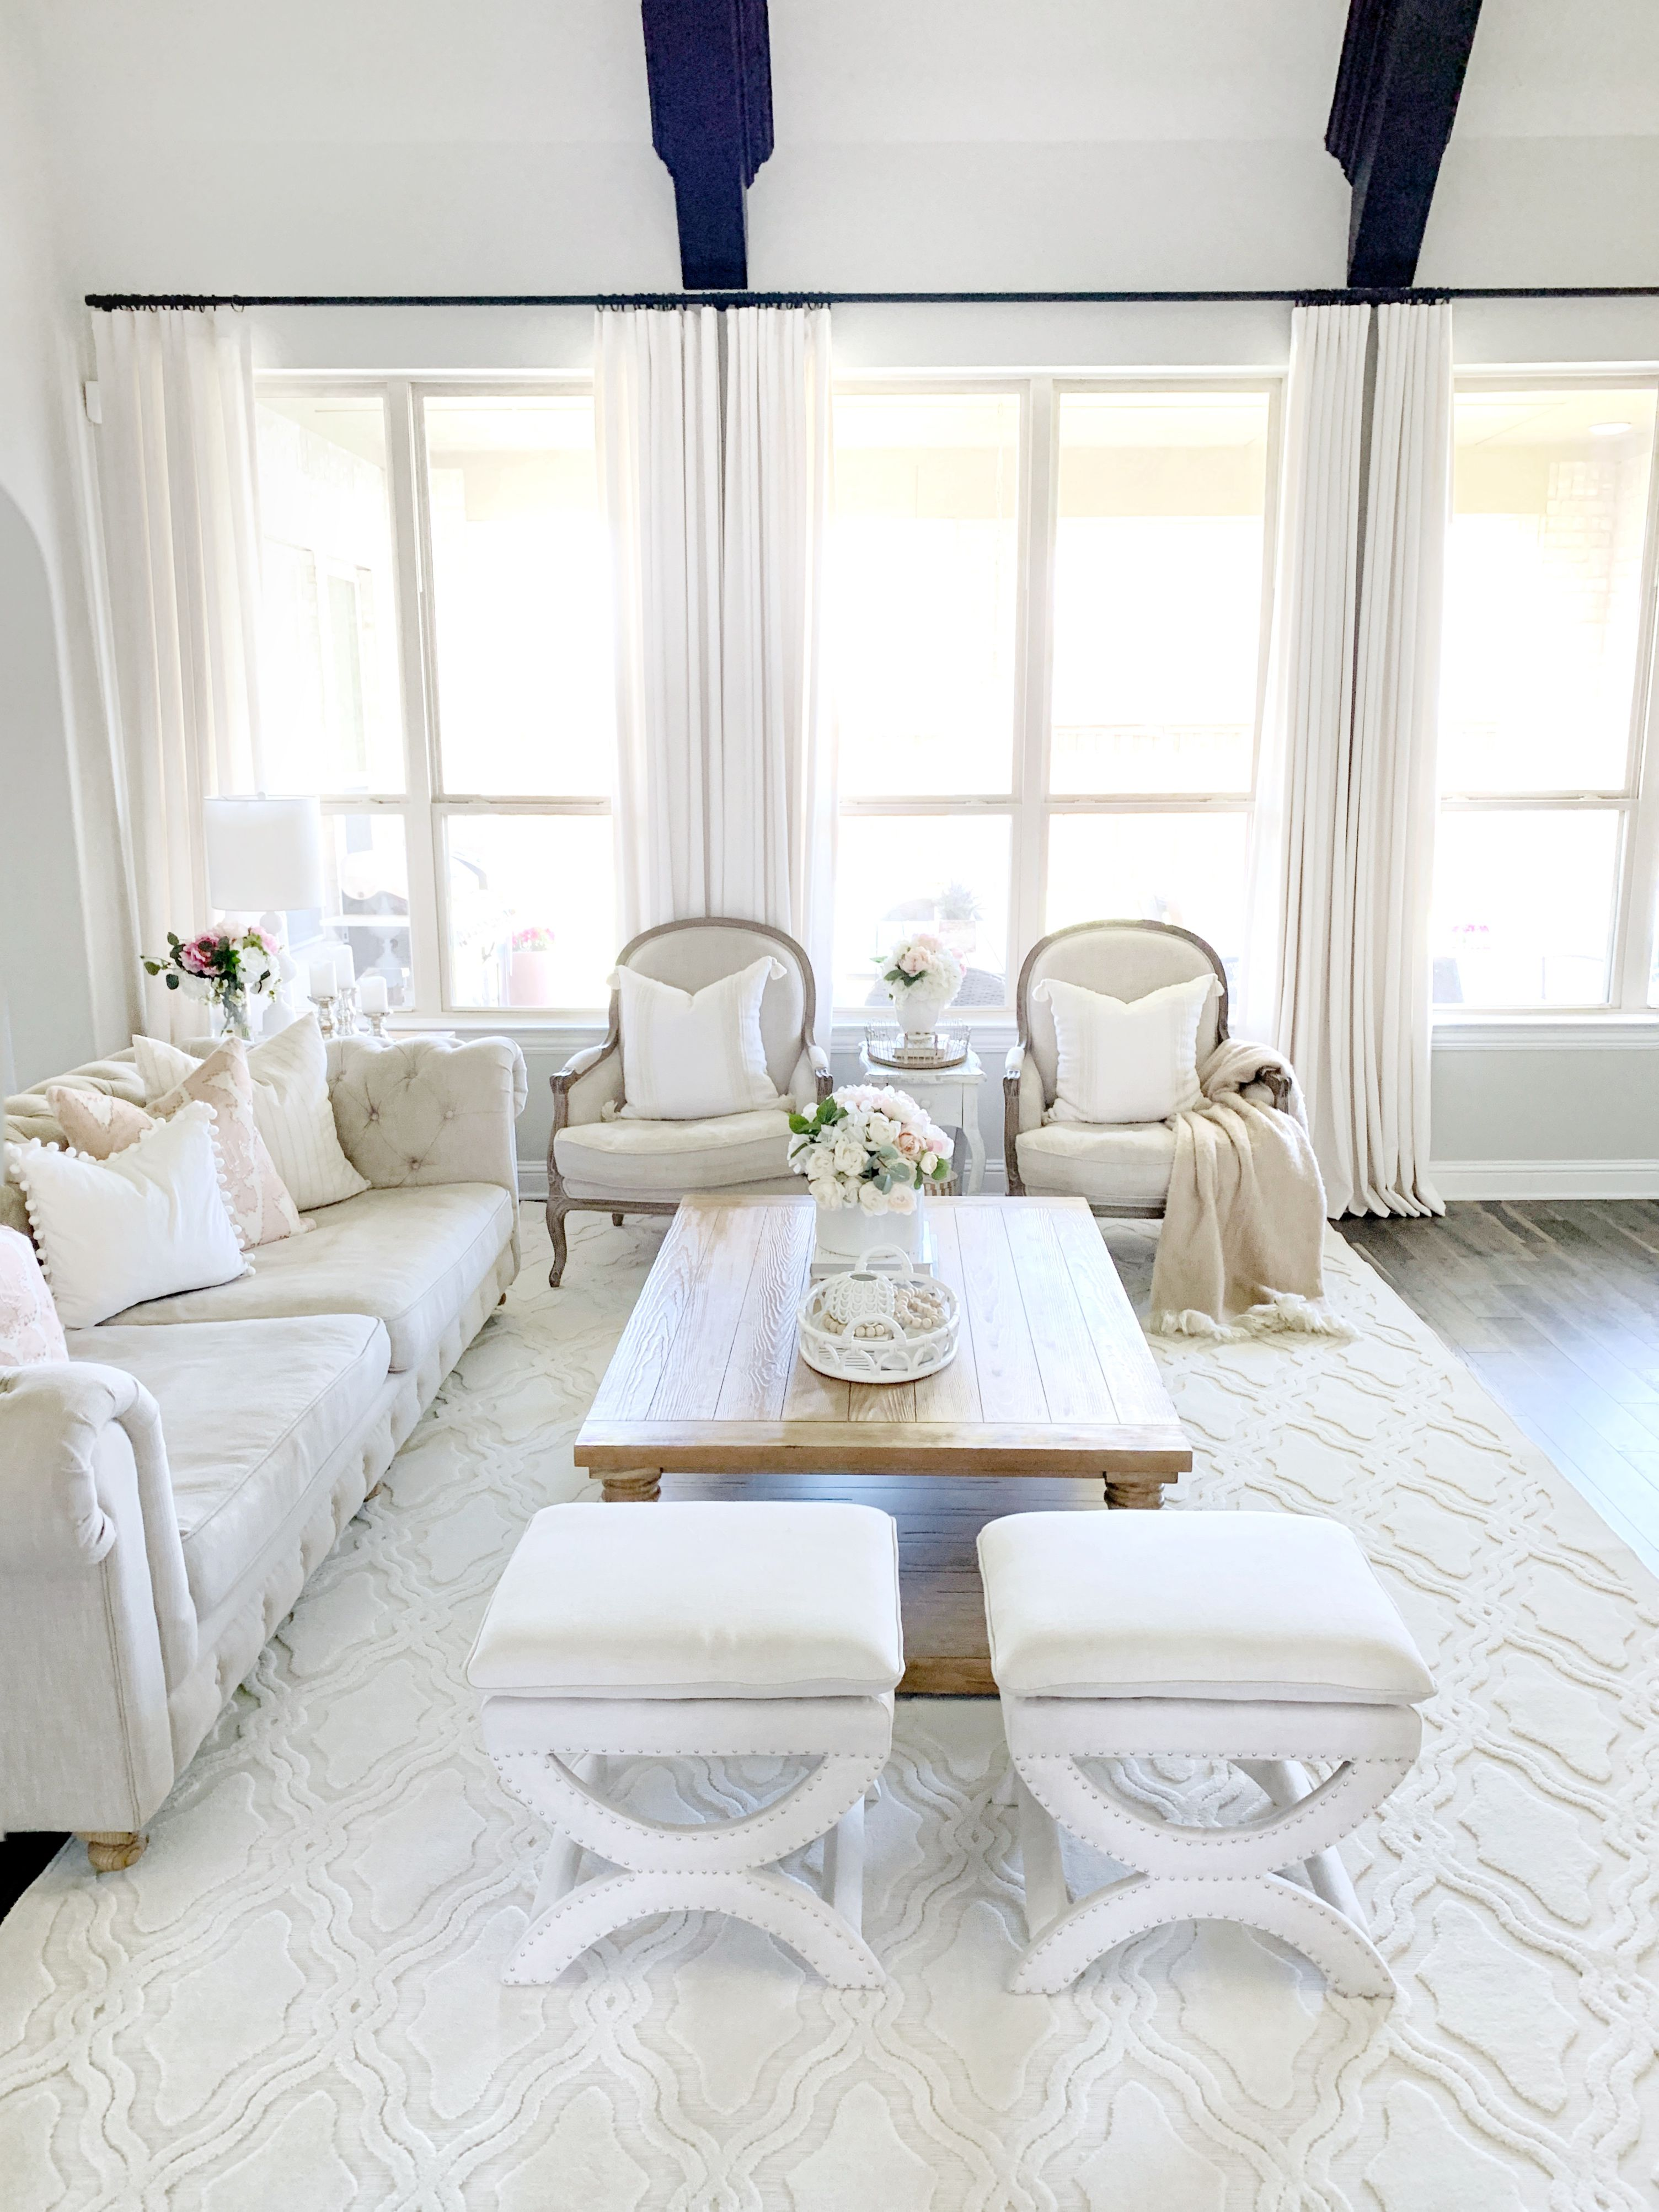 Cotton Blossom Home Decor Gorgeous Sofas Rooms Home D